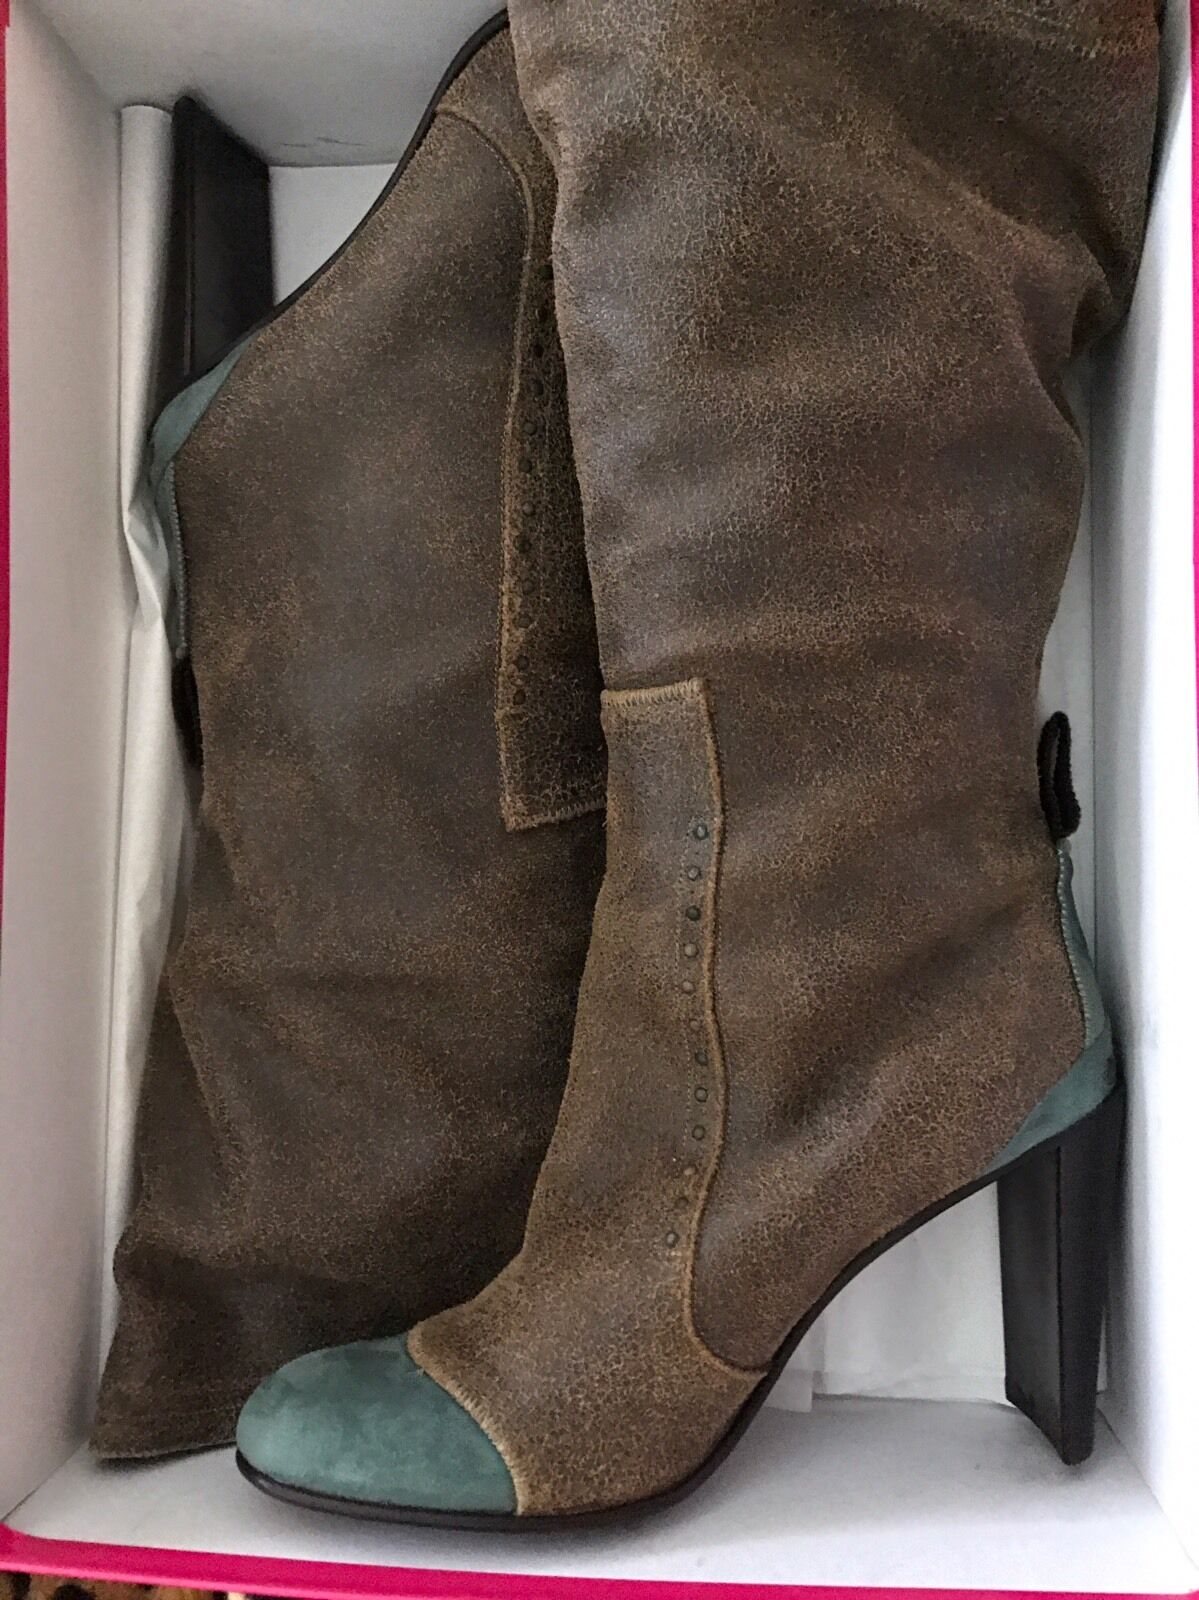 New Materia Prima By Gofferdo 41 Fantini Distressed Leder Stiefel 41 Gofferdo Made In  2faad6